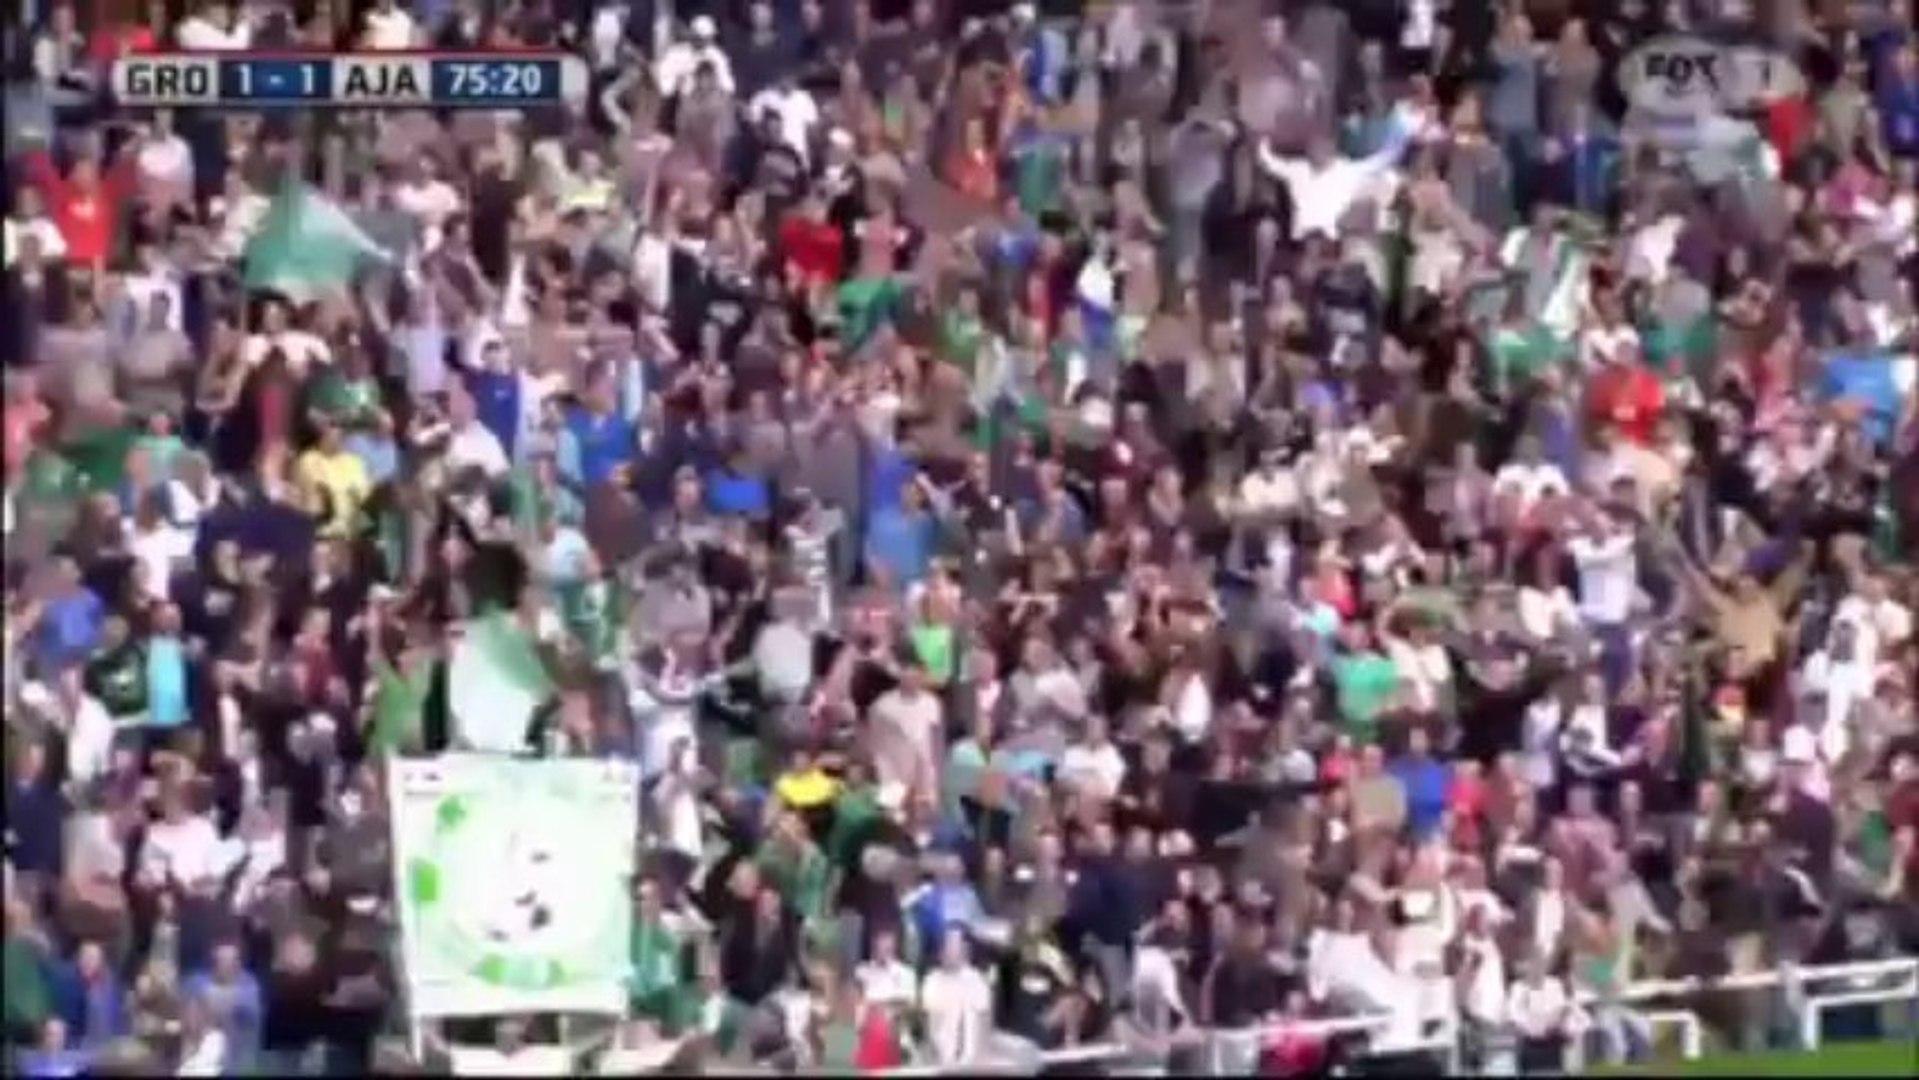 Groningen 1 - 1 Ajax (All Goals And Highlights) 01-09-13 Eredivisie/FoxSports